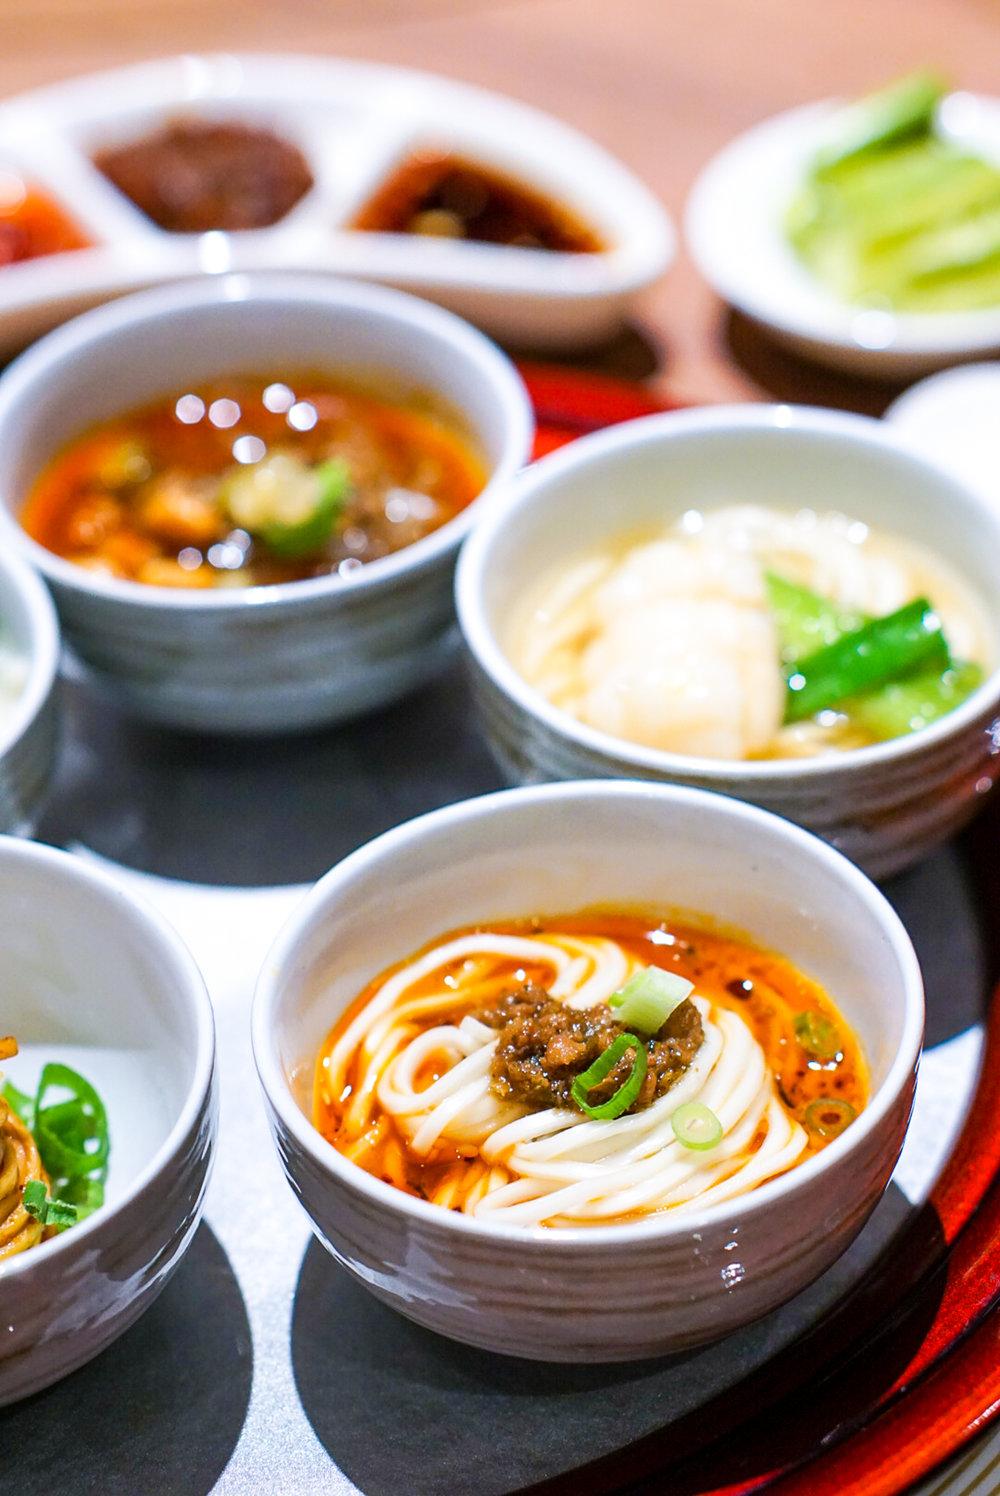 Si Chuan Dou Hua Grand Dim Sum Brunch - Si Chuan Dou Hua Five Elements Noodles